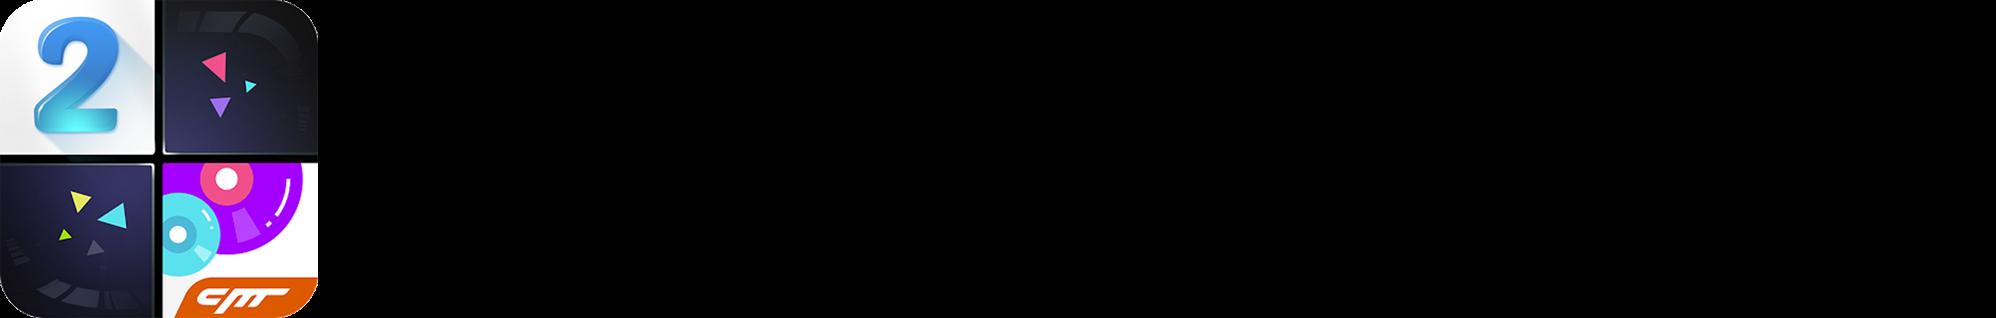 pianotiles2-logo